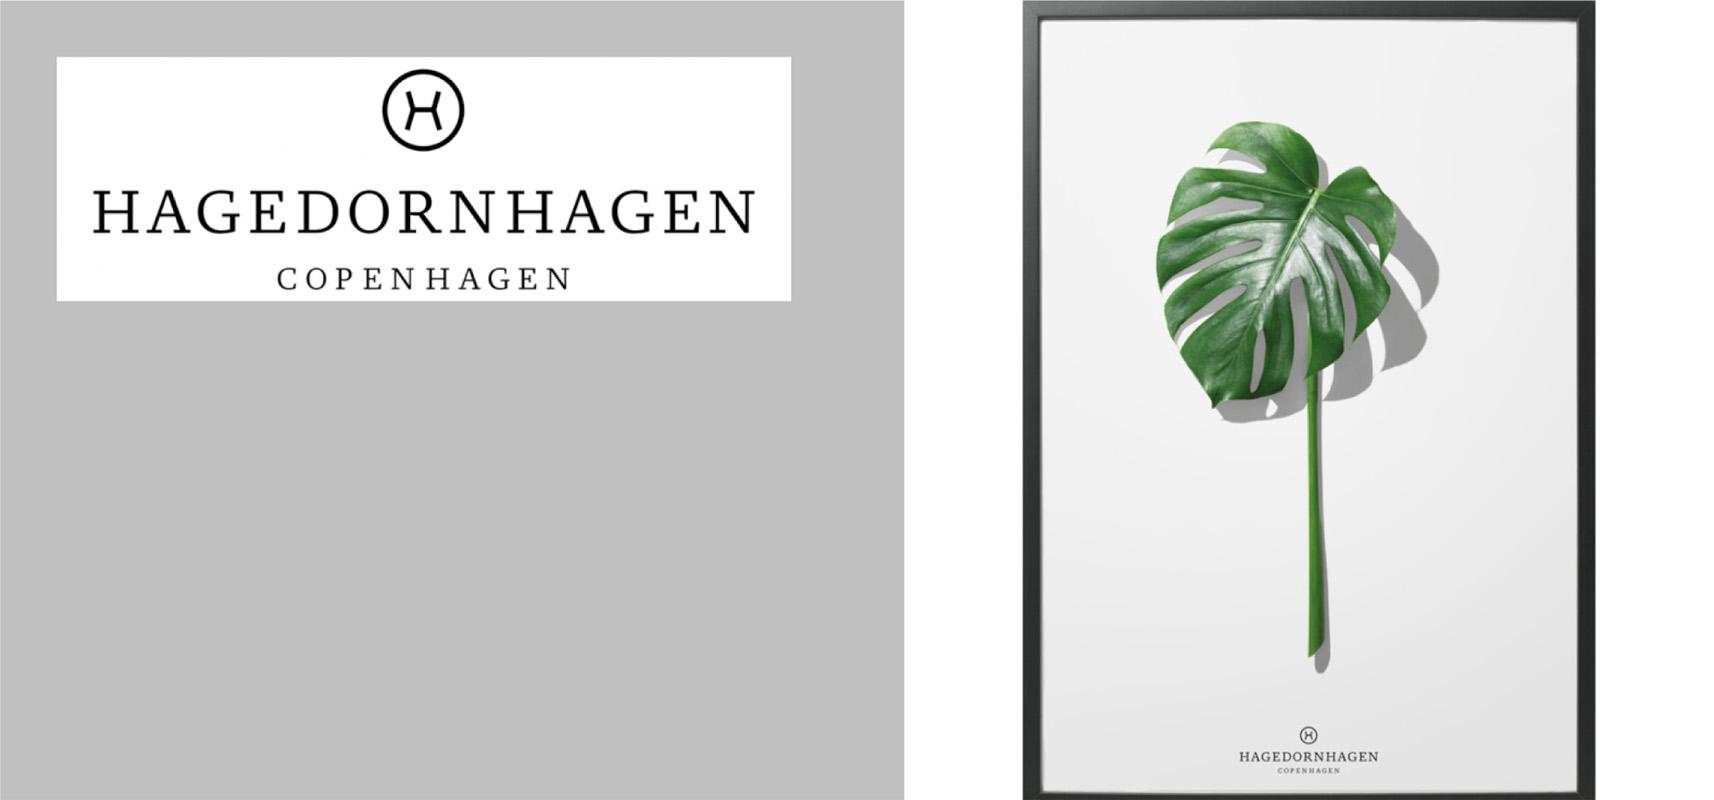 Hagedornhagen-Copenhagen